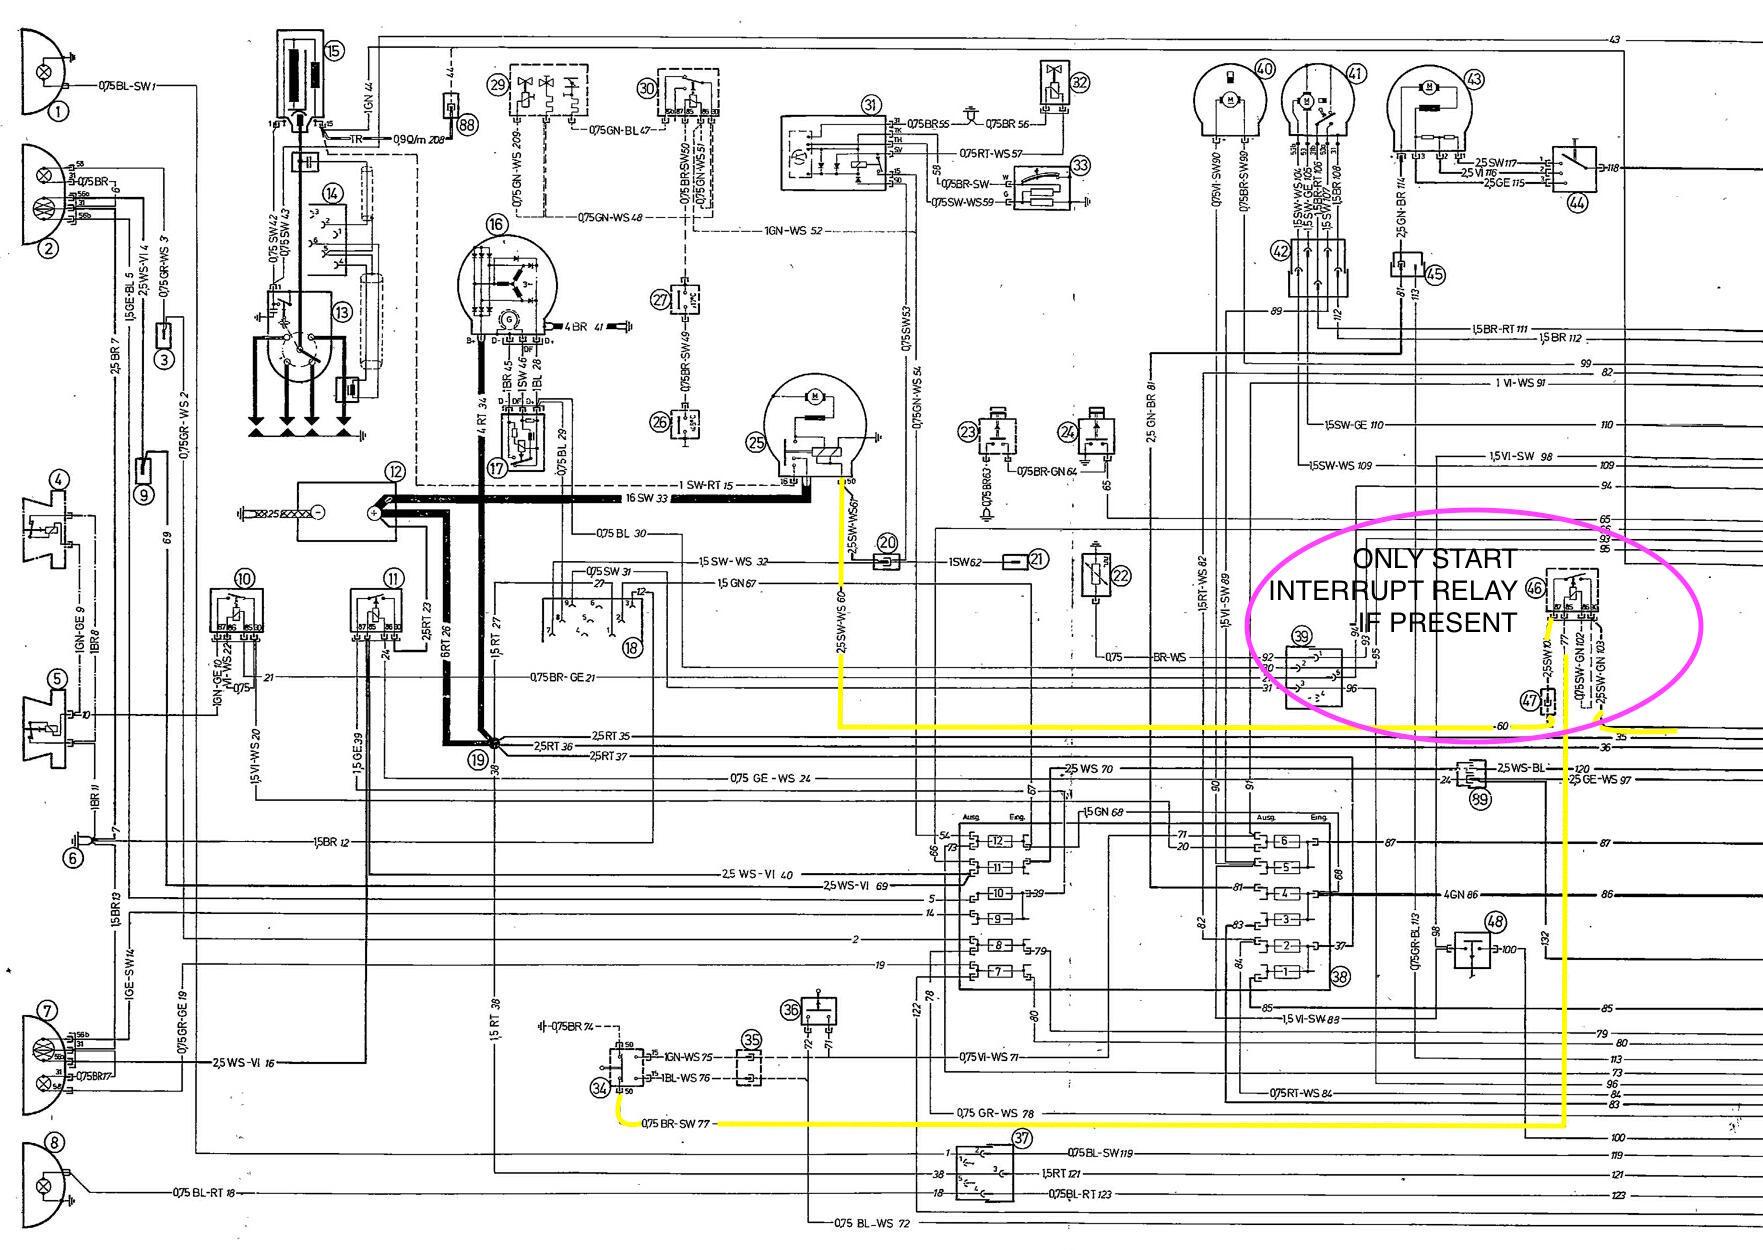 hight resolution of 1973 wiring diagram bmw 2002 wiring diagram sheet 1972 bmw 2002 wiring diagram schematic